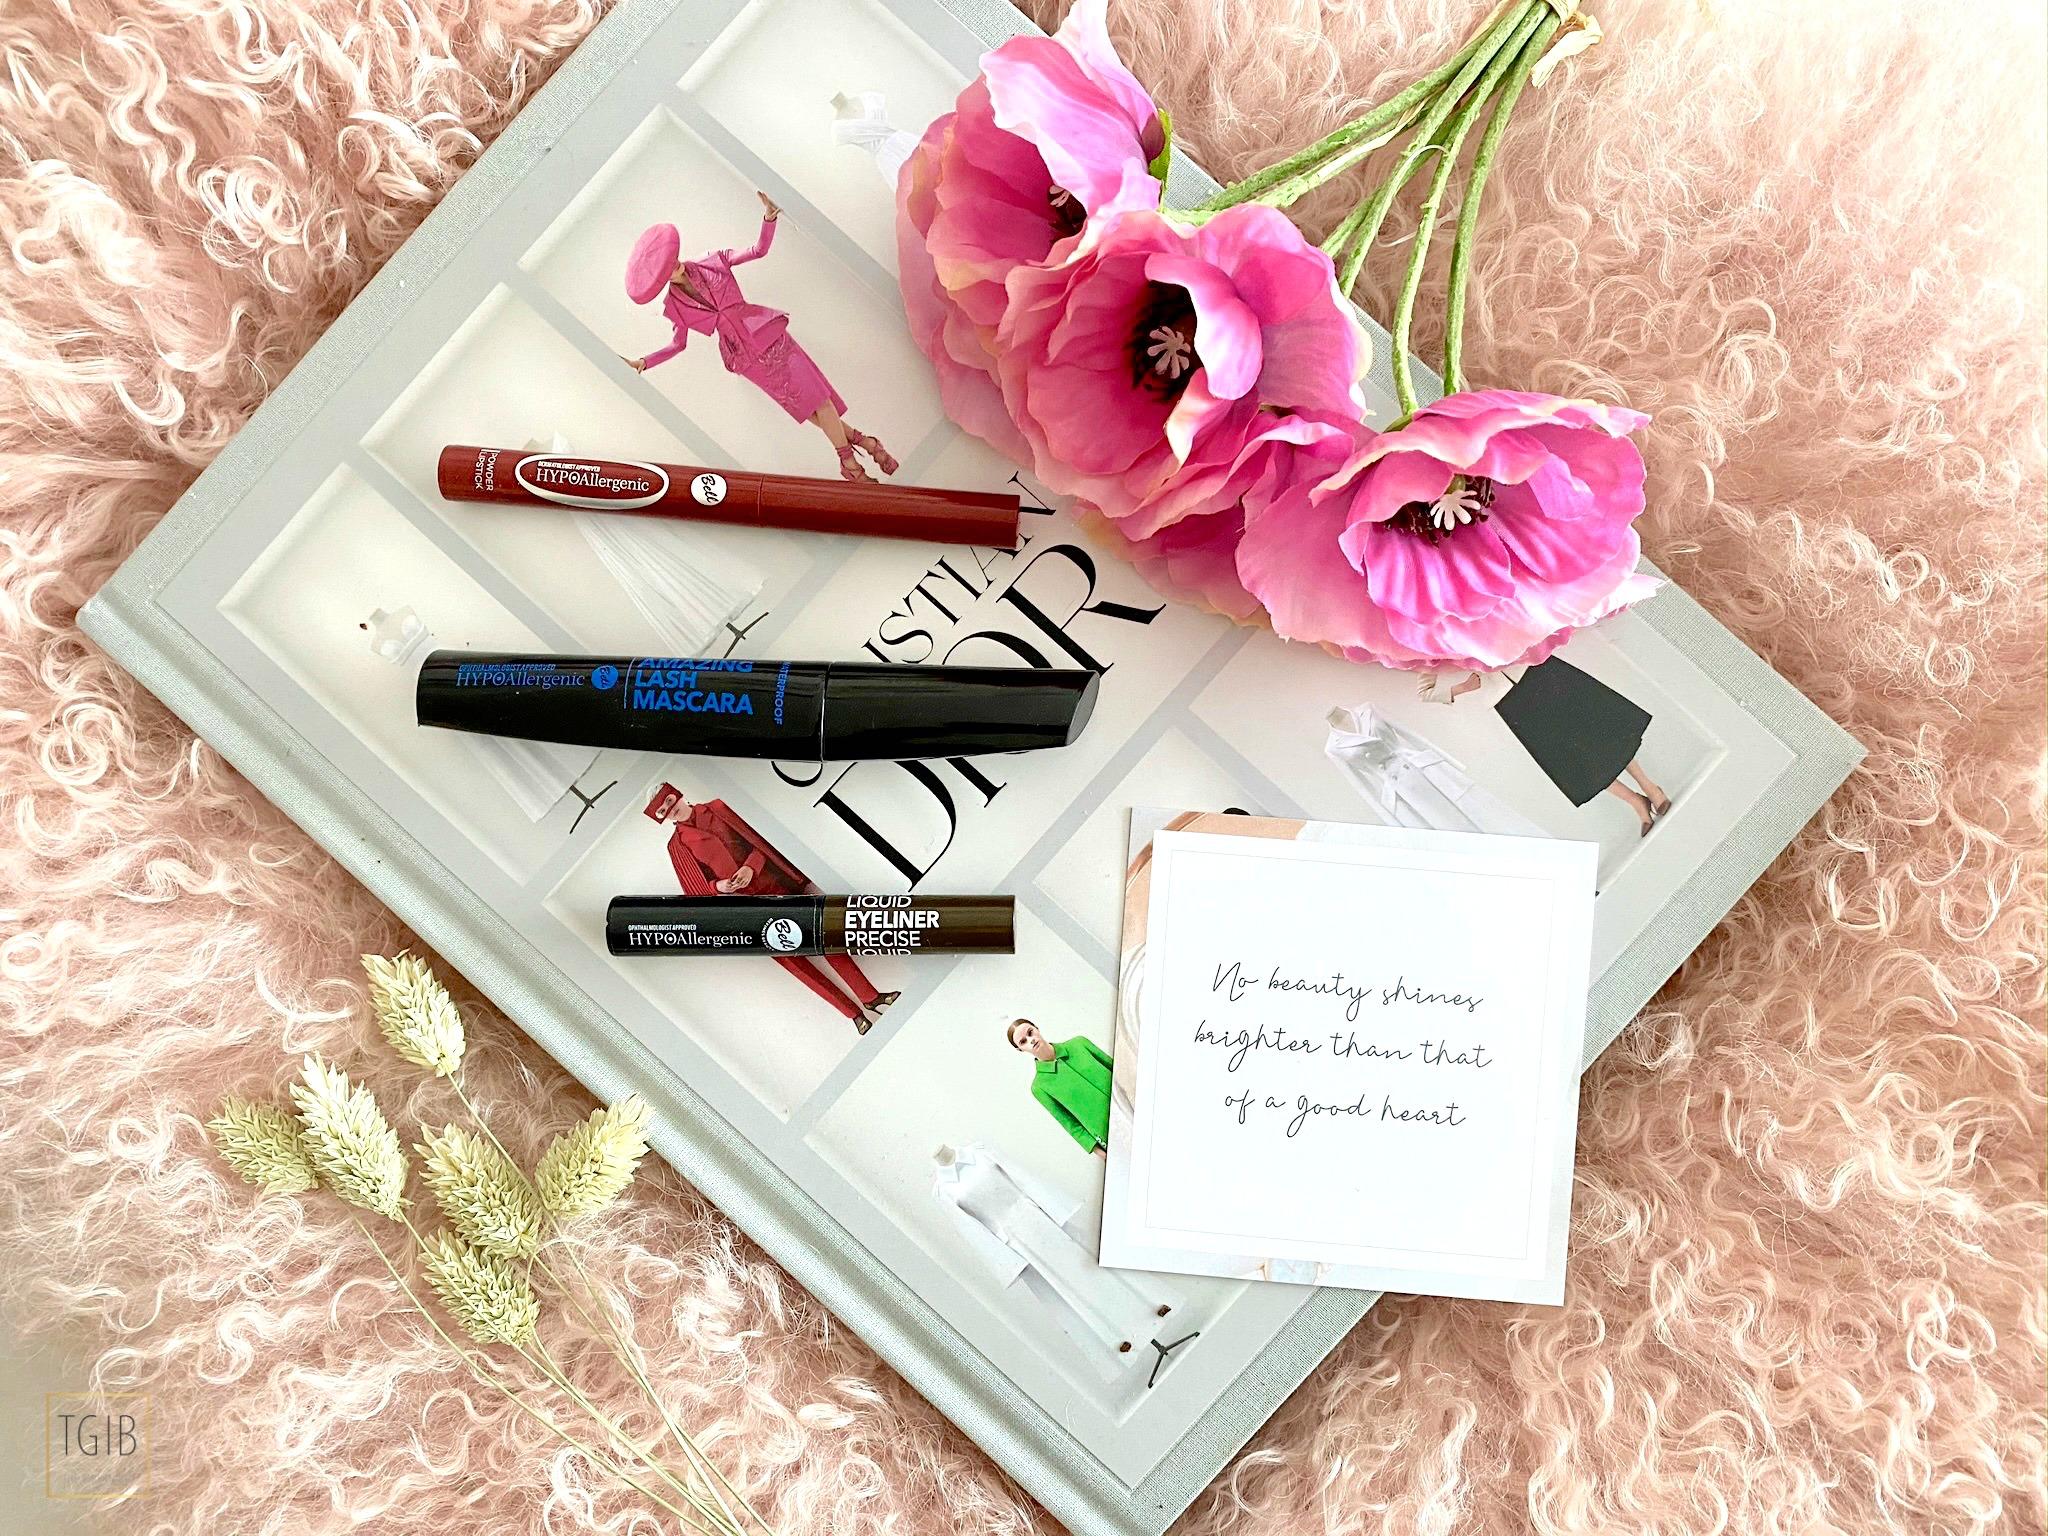 Hypoallergenic Beauty Review Sams-online